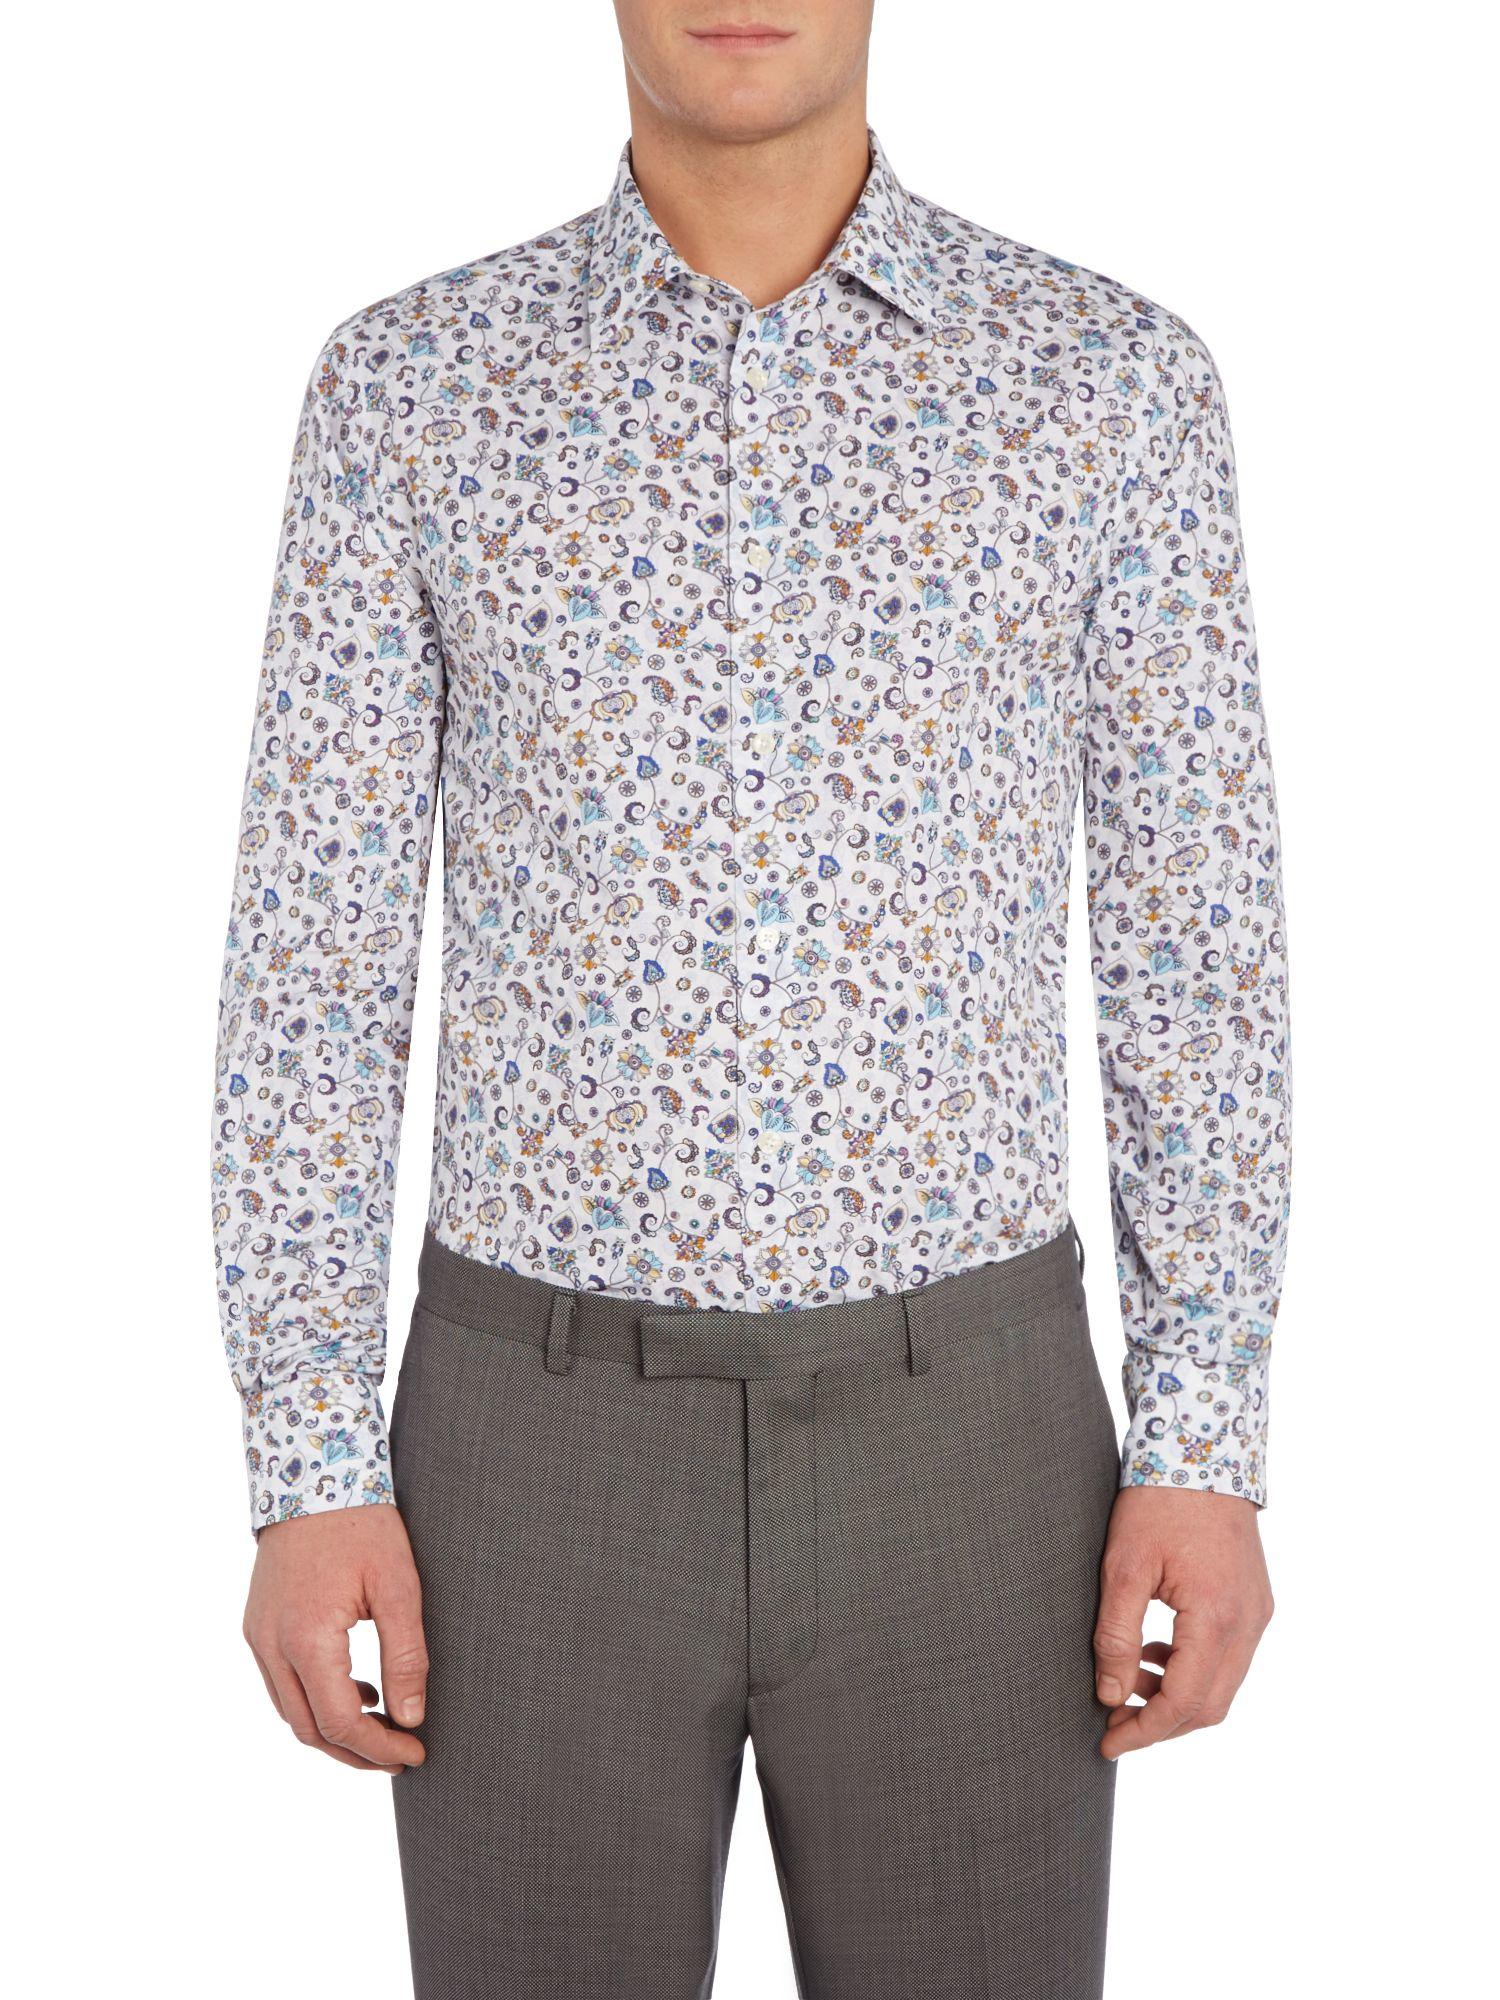 New lingwood malton floral print shirt in white for men for Mens white floral shirt